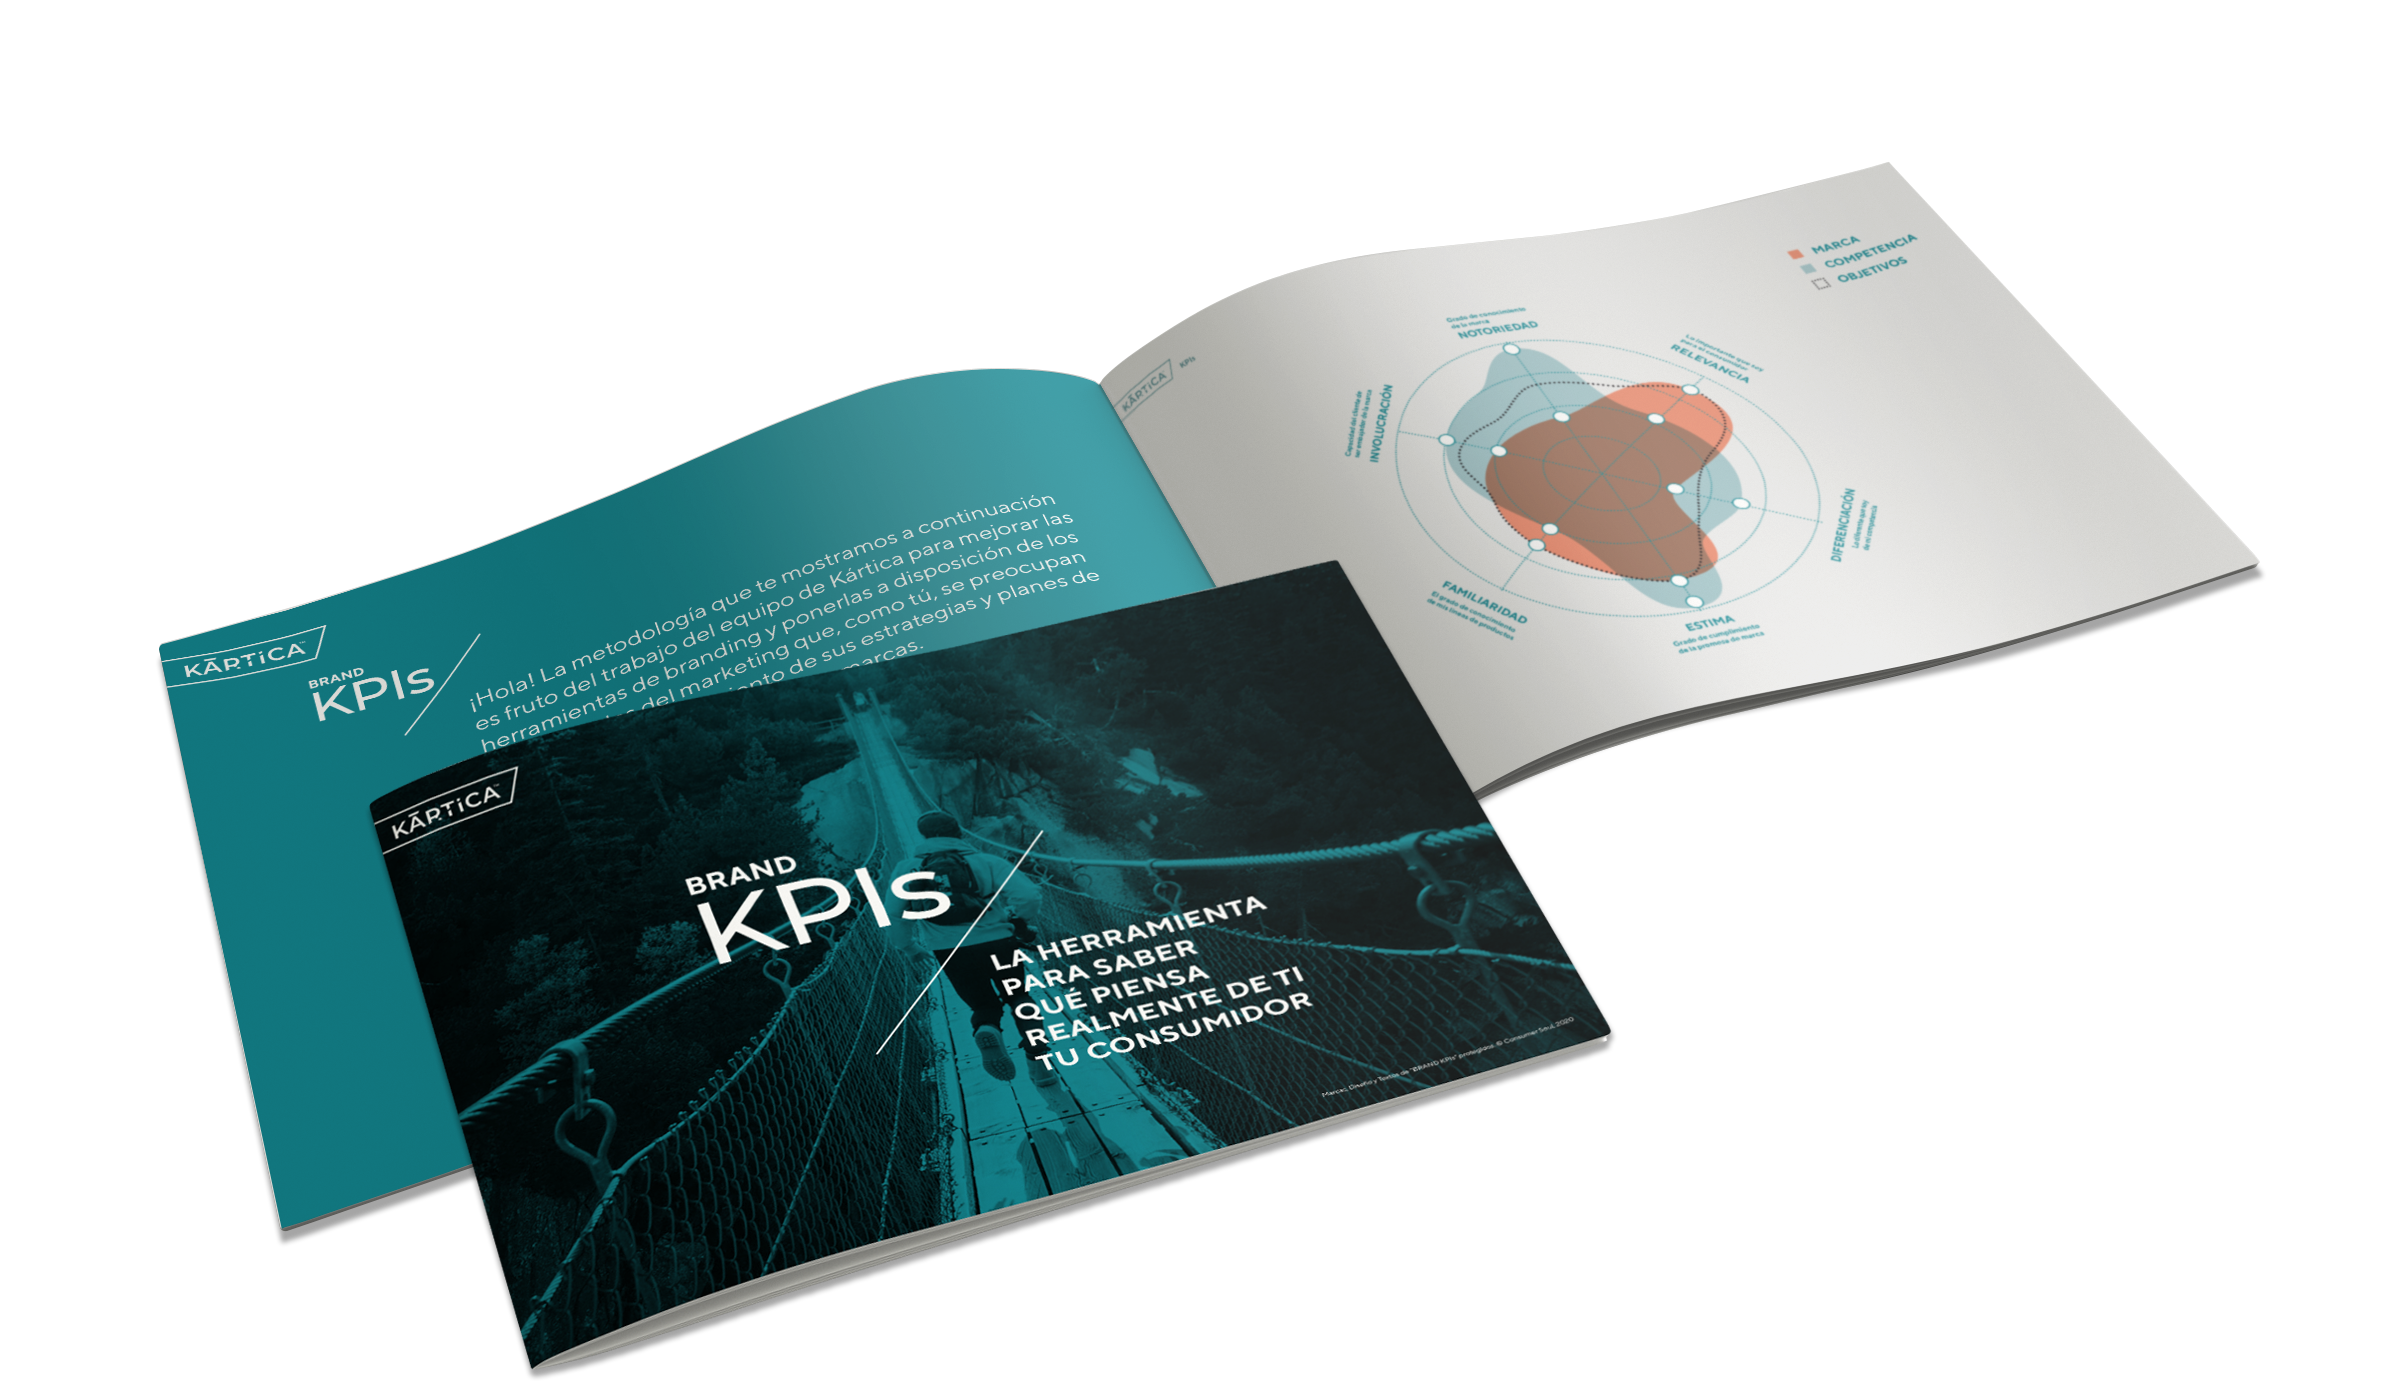 Brand KPIs